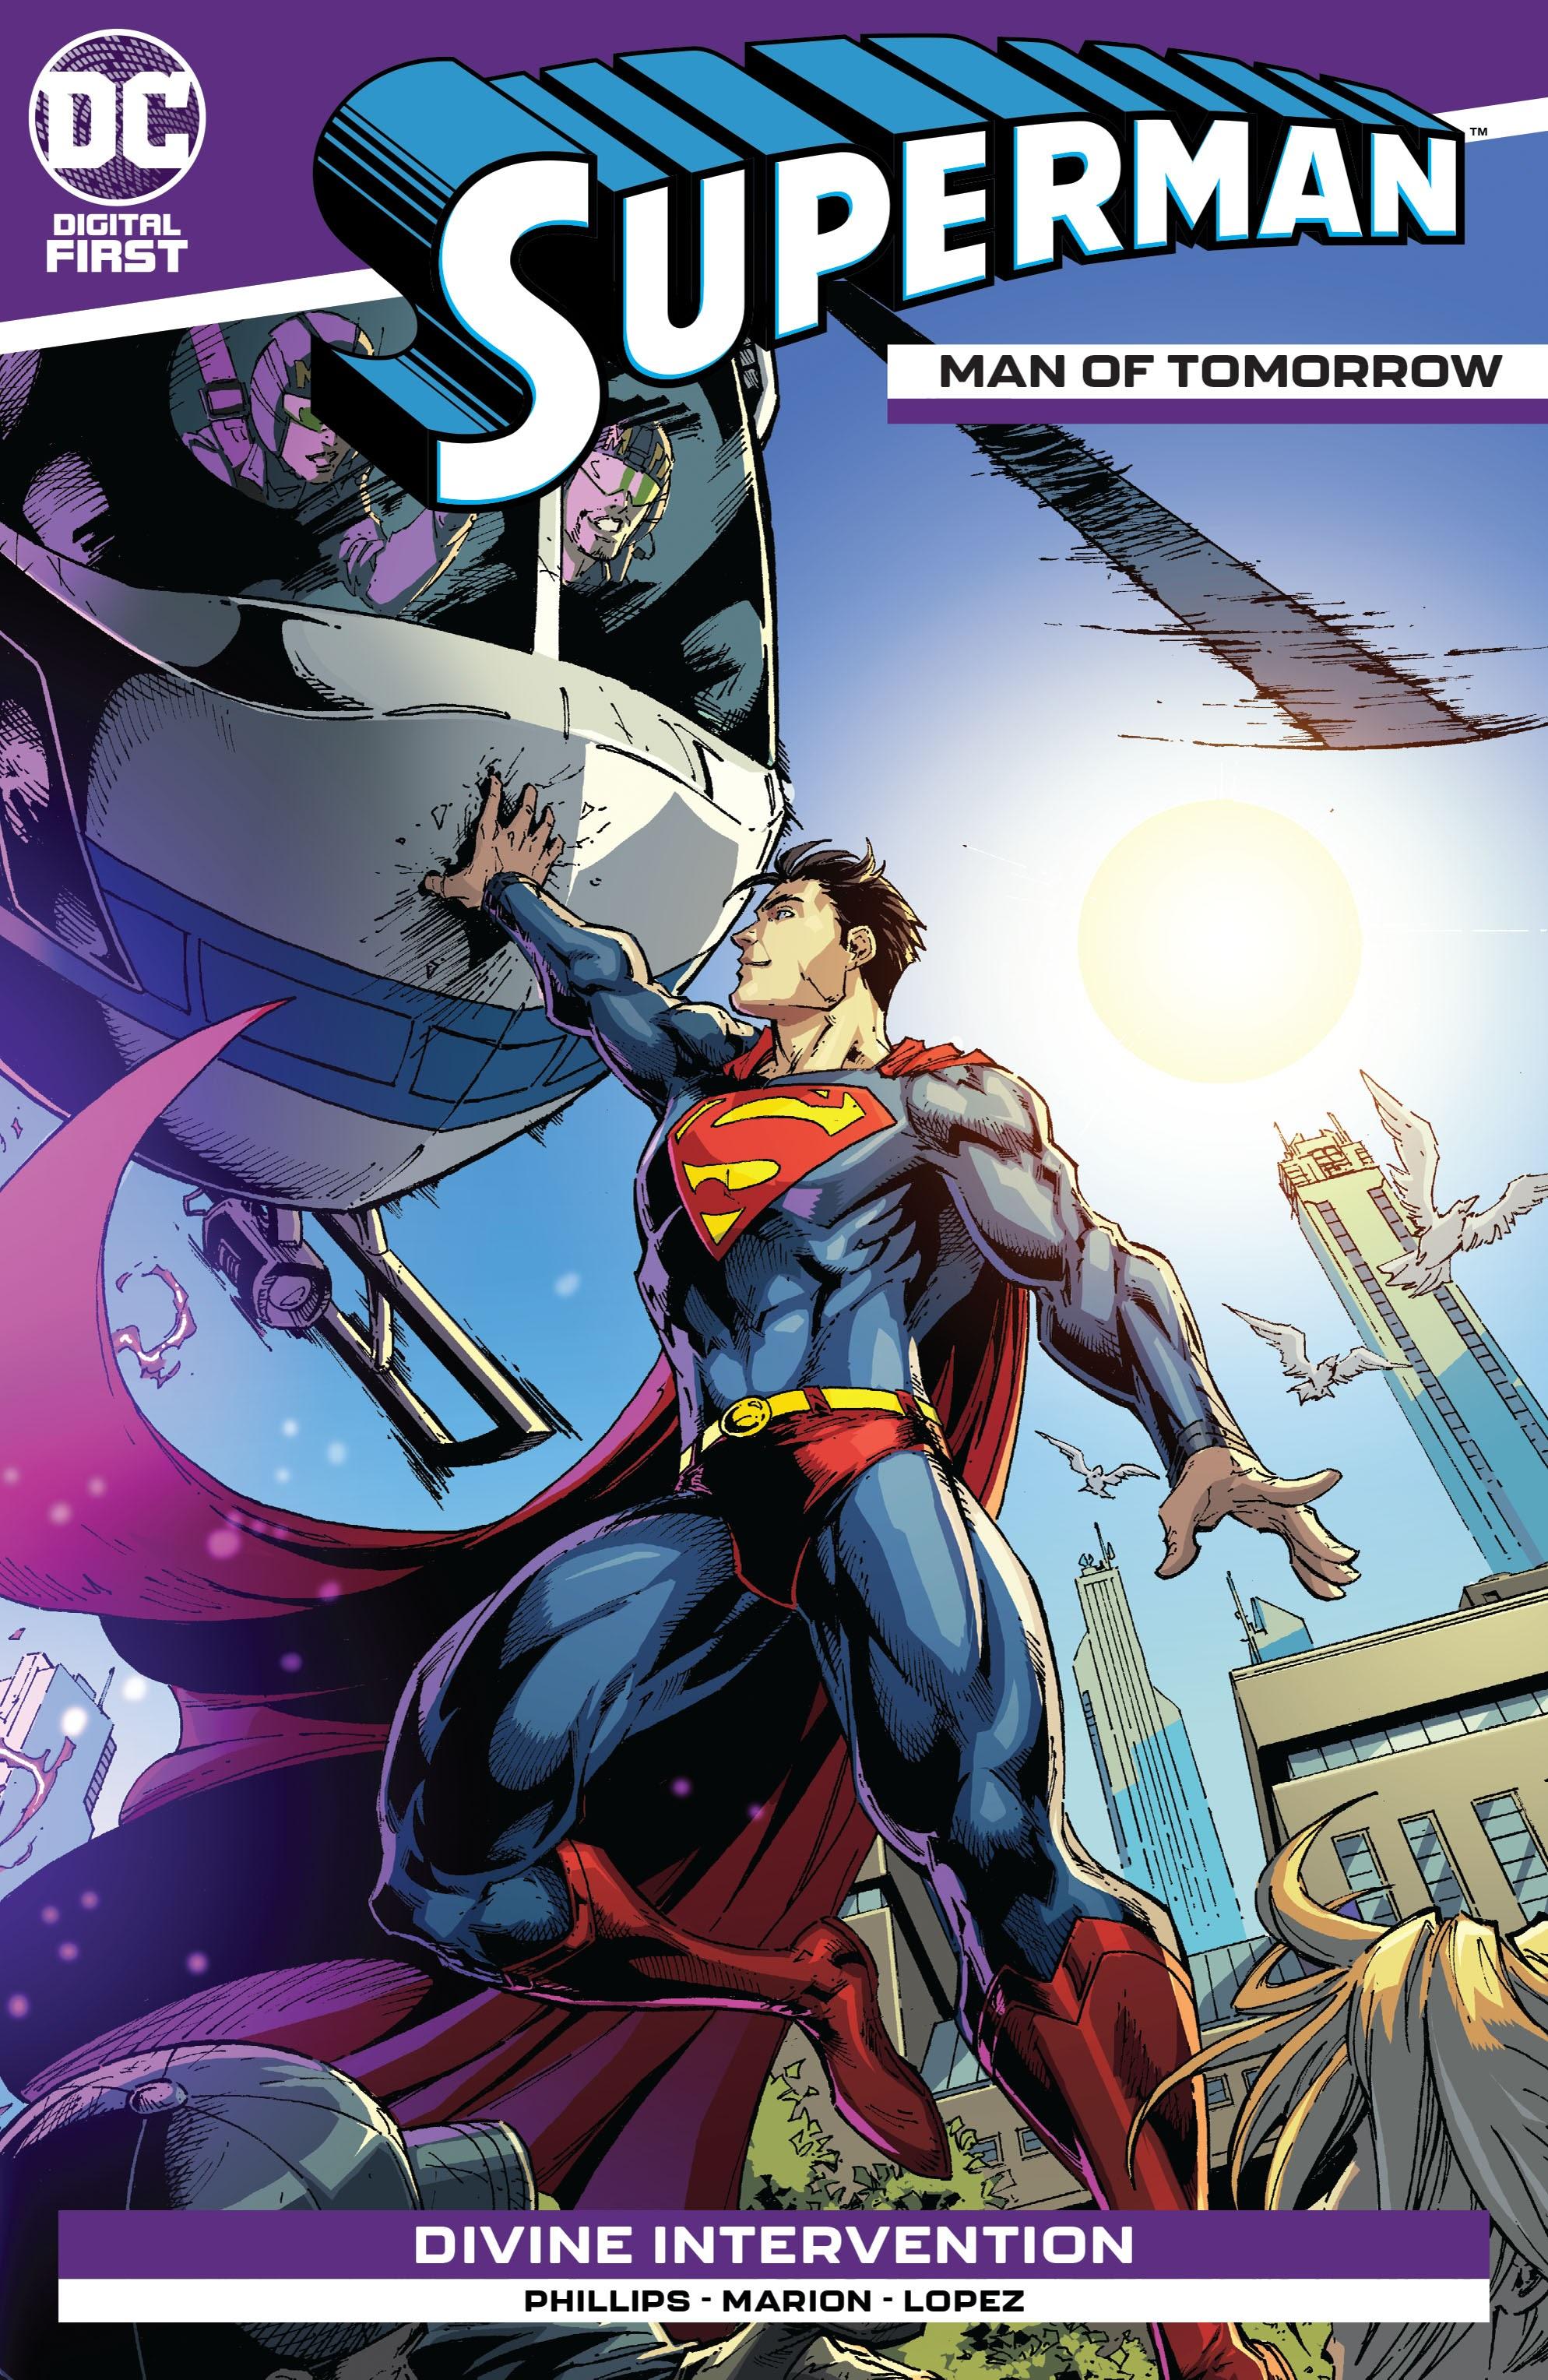 Superman: Man of Tomorrow #17 The Aspiring Kryptonian